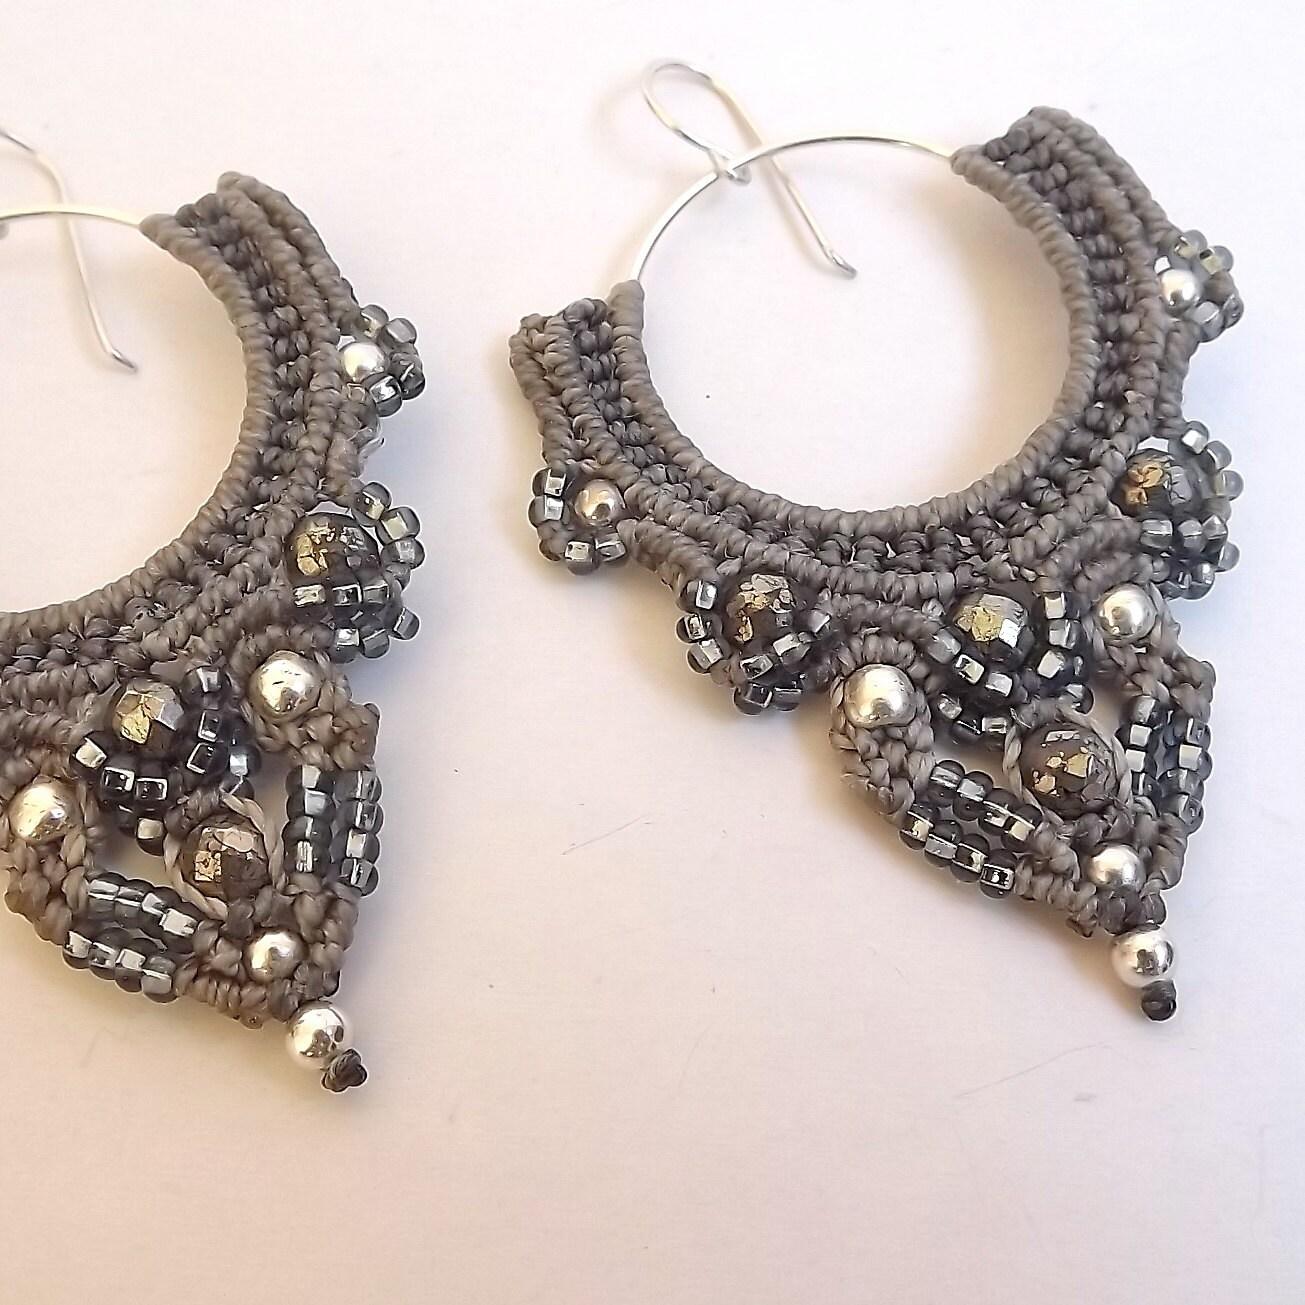 Macrame Earrings - Shades of Gray, Silver and Pyrite - neferknots